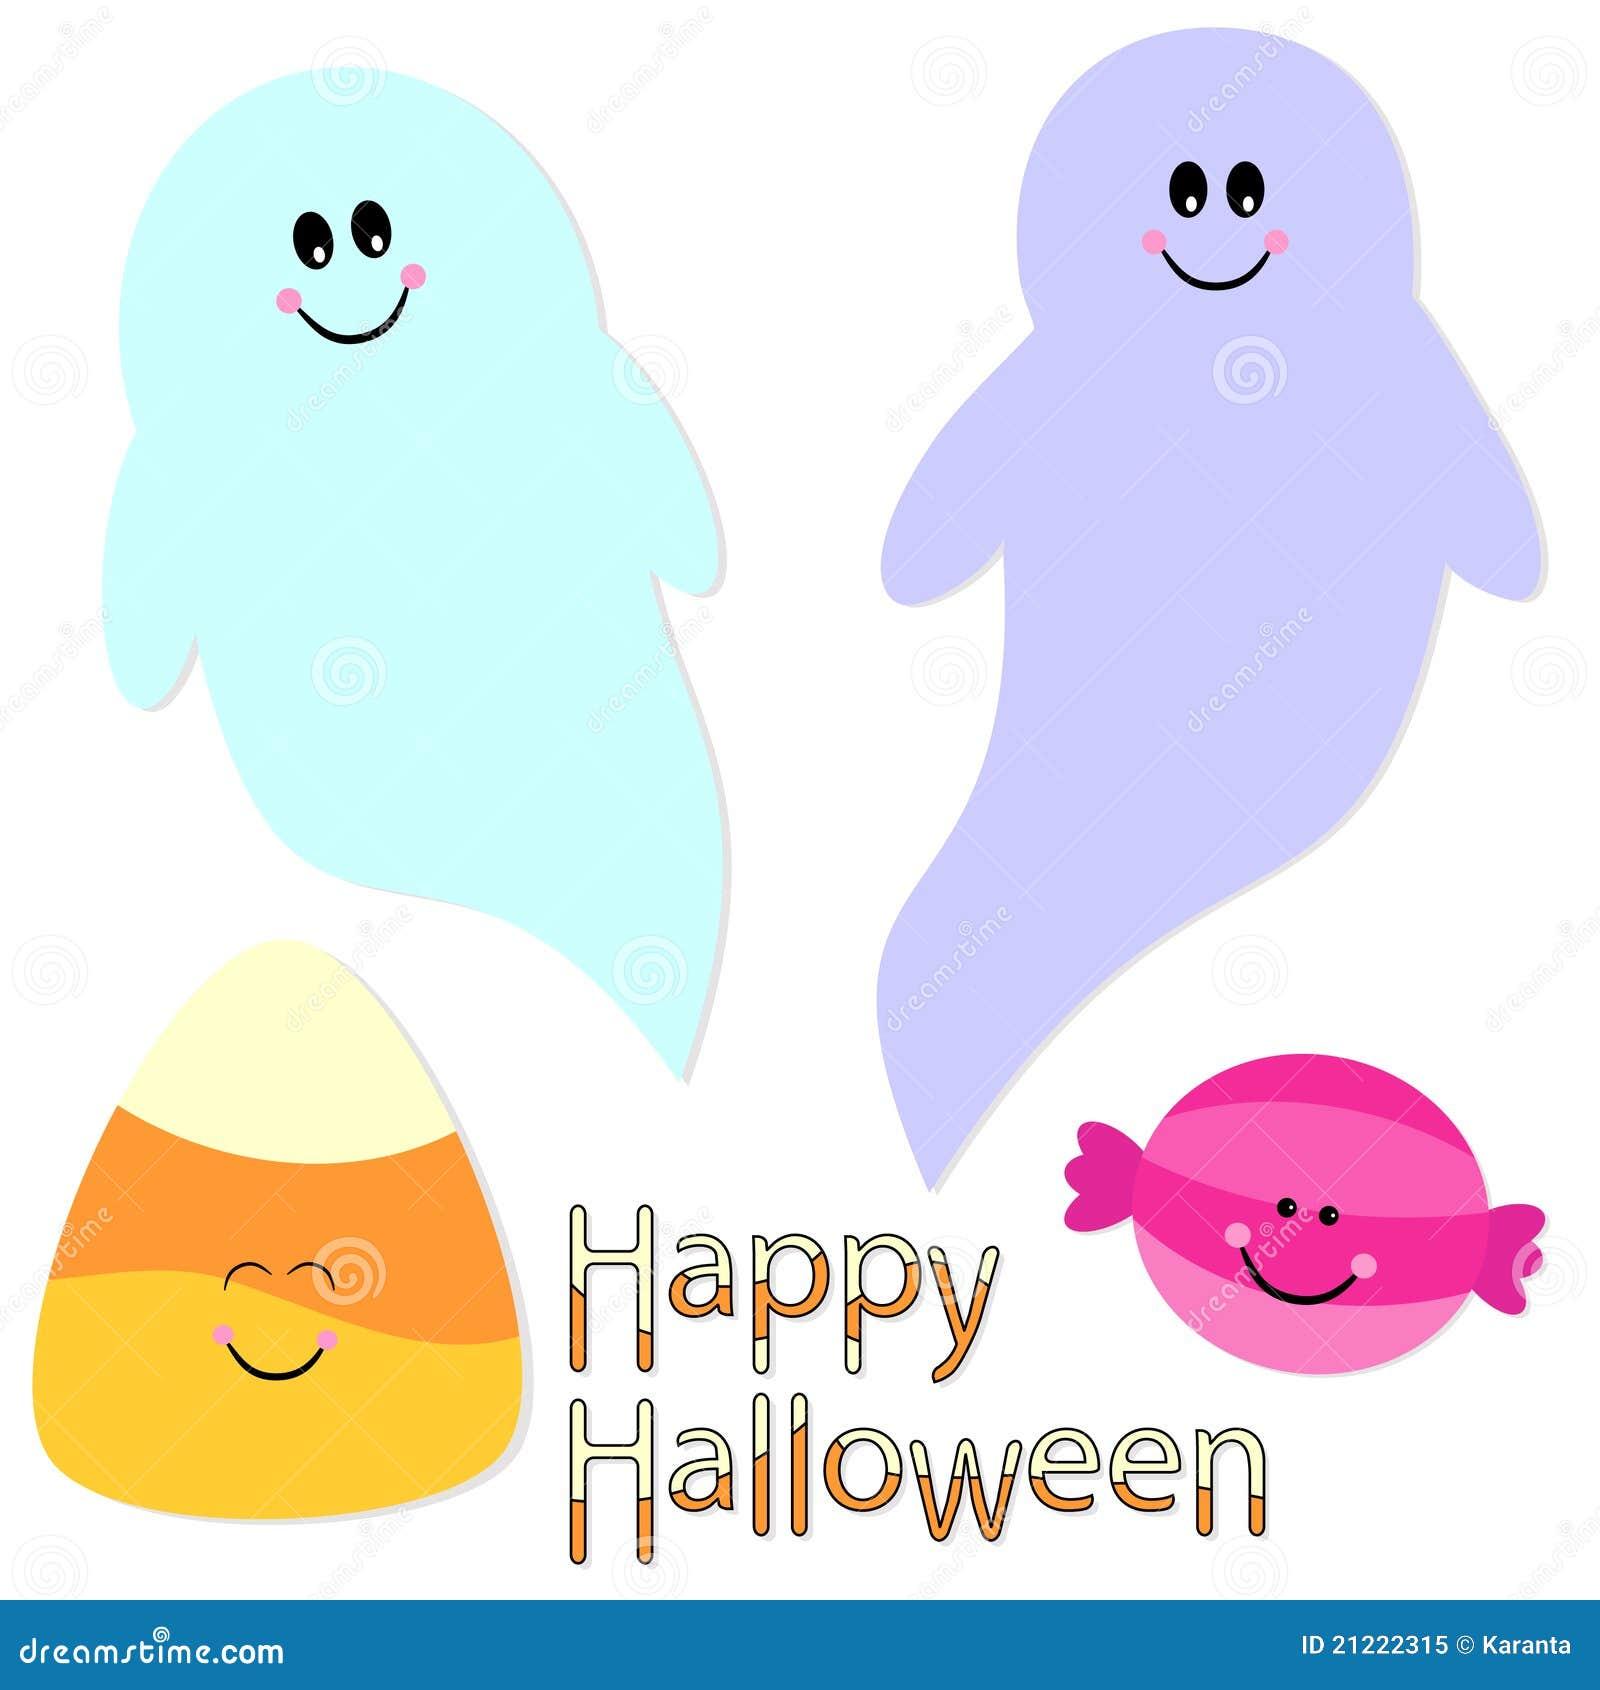 cute halloween graphics collection stock illustration illustration